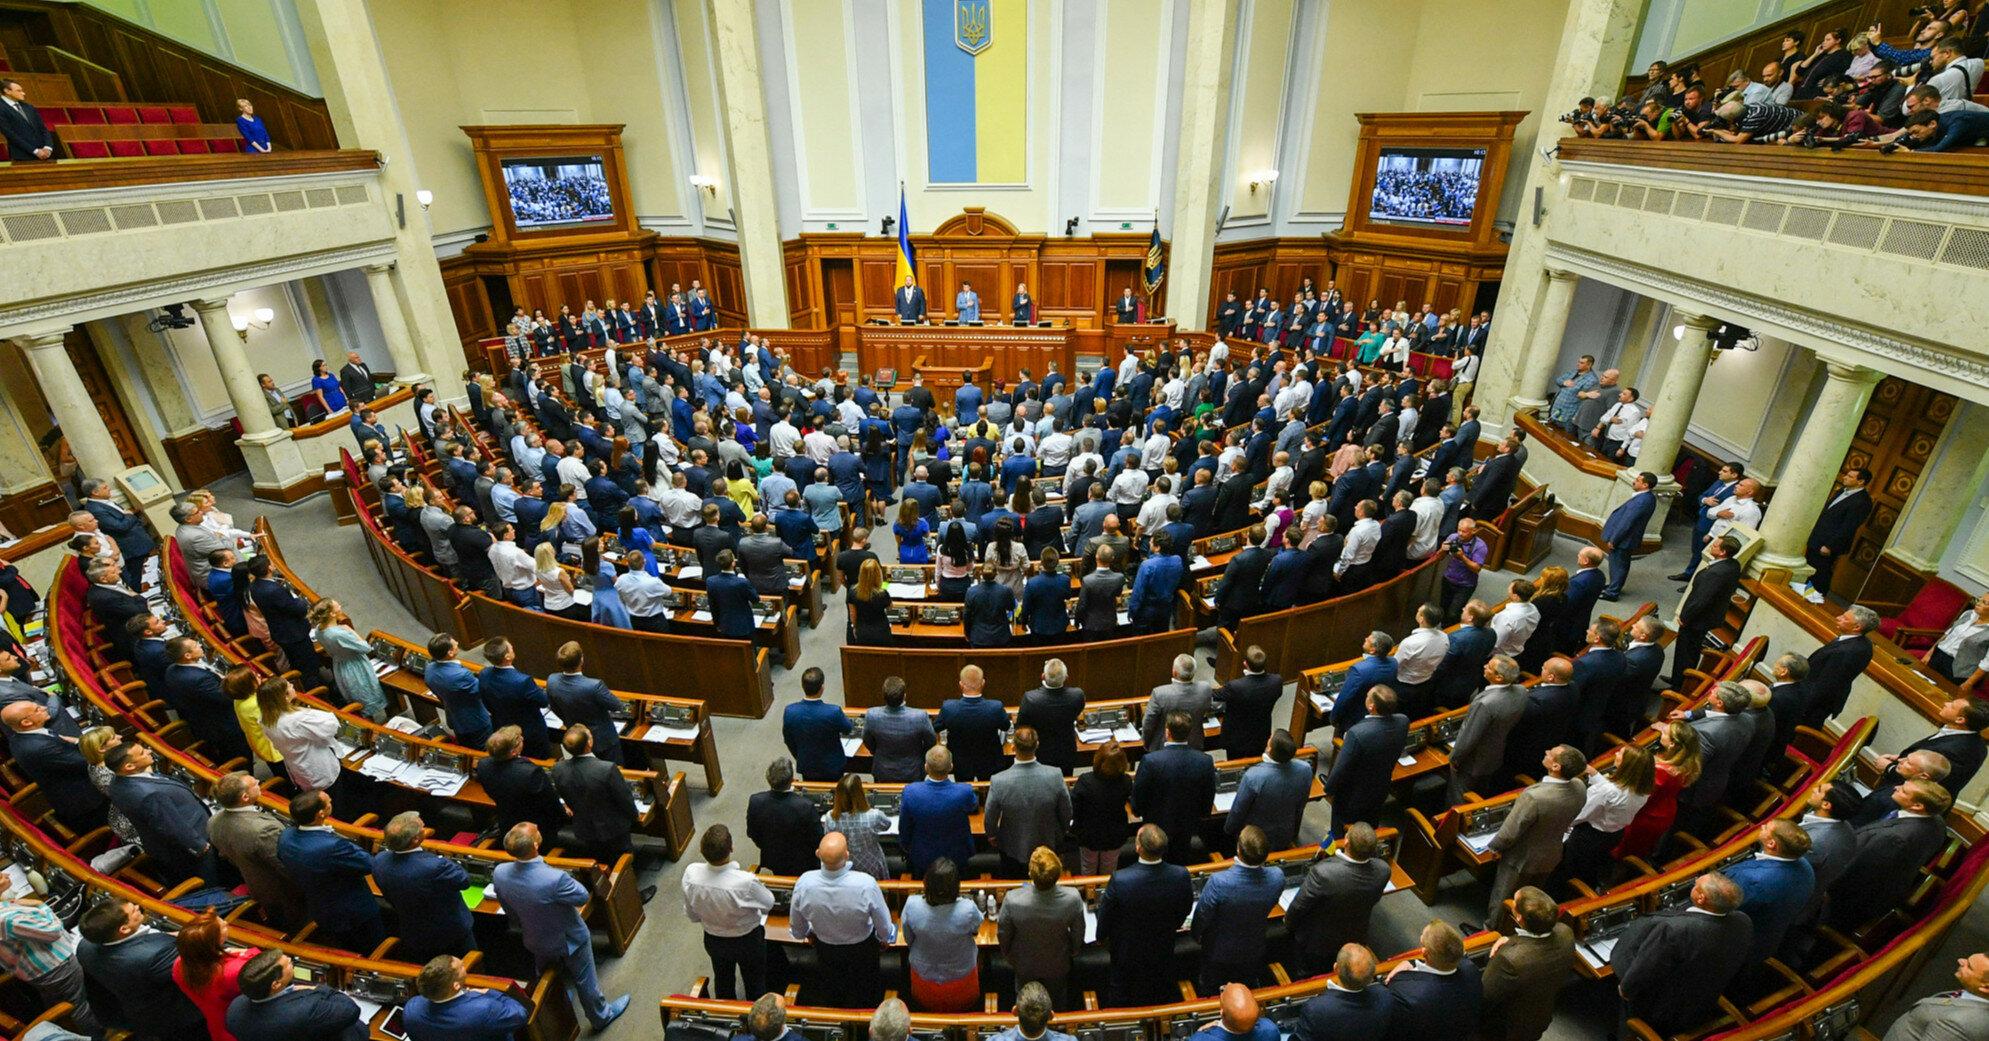 Три четверти украинцев не доверяют партиям